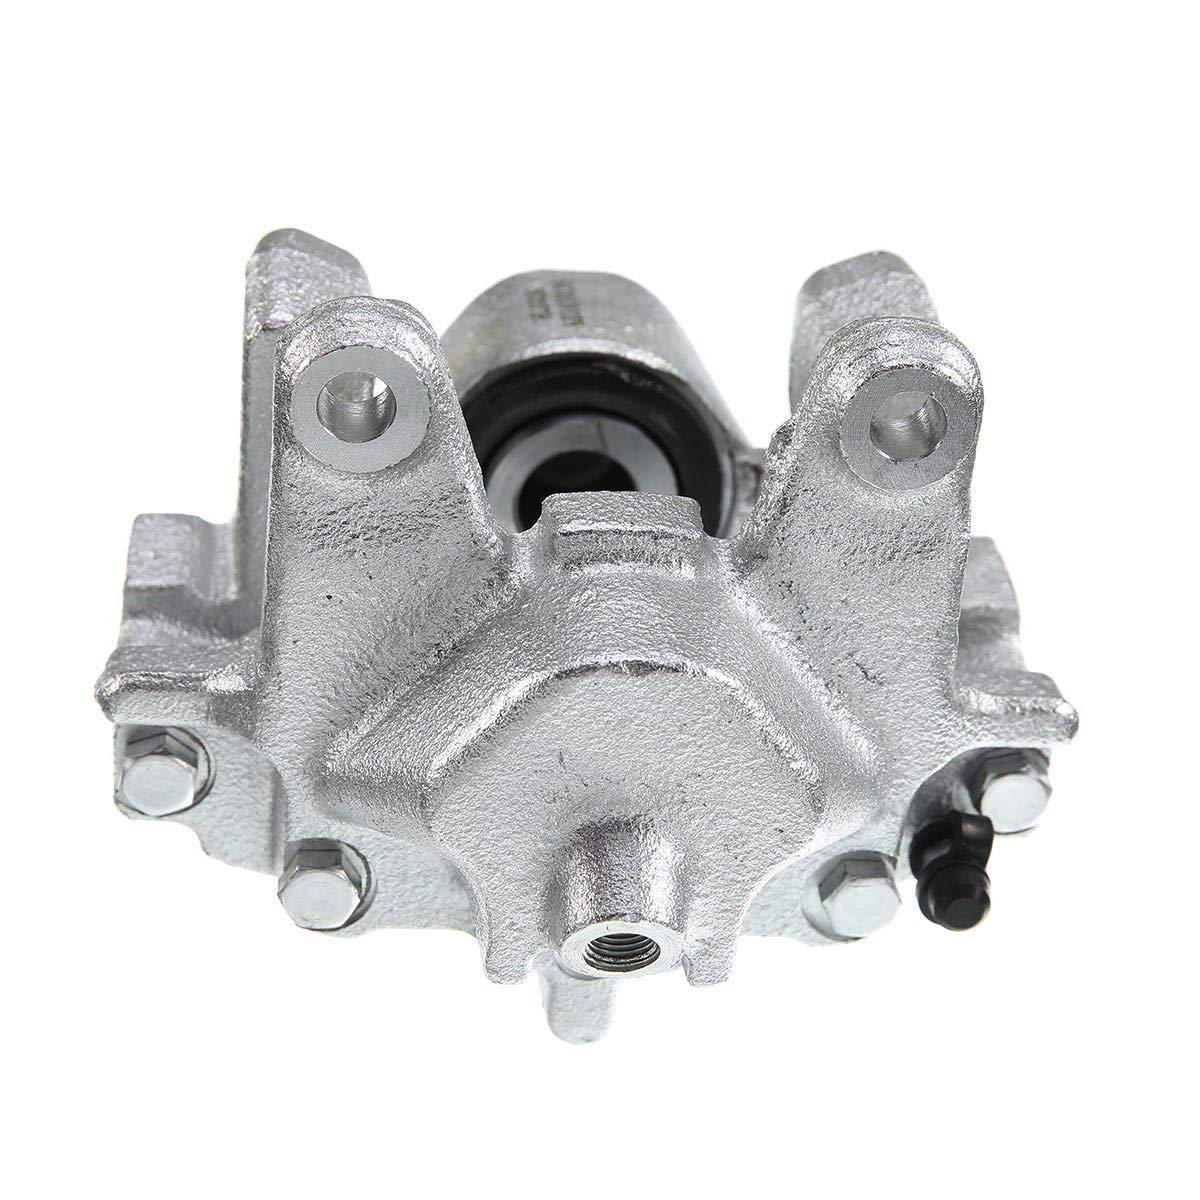 Set of 2 Rear Side Brake Caliper Assembly Fit Mercedes-Benz C230 C240 C280 C320 CLK320 CLK350 CLK430 SLK350